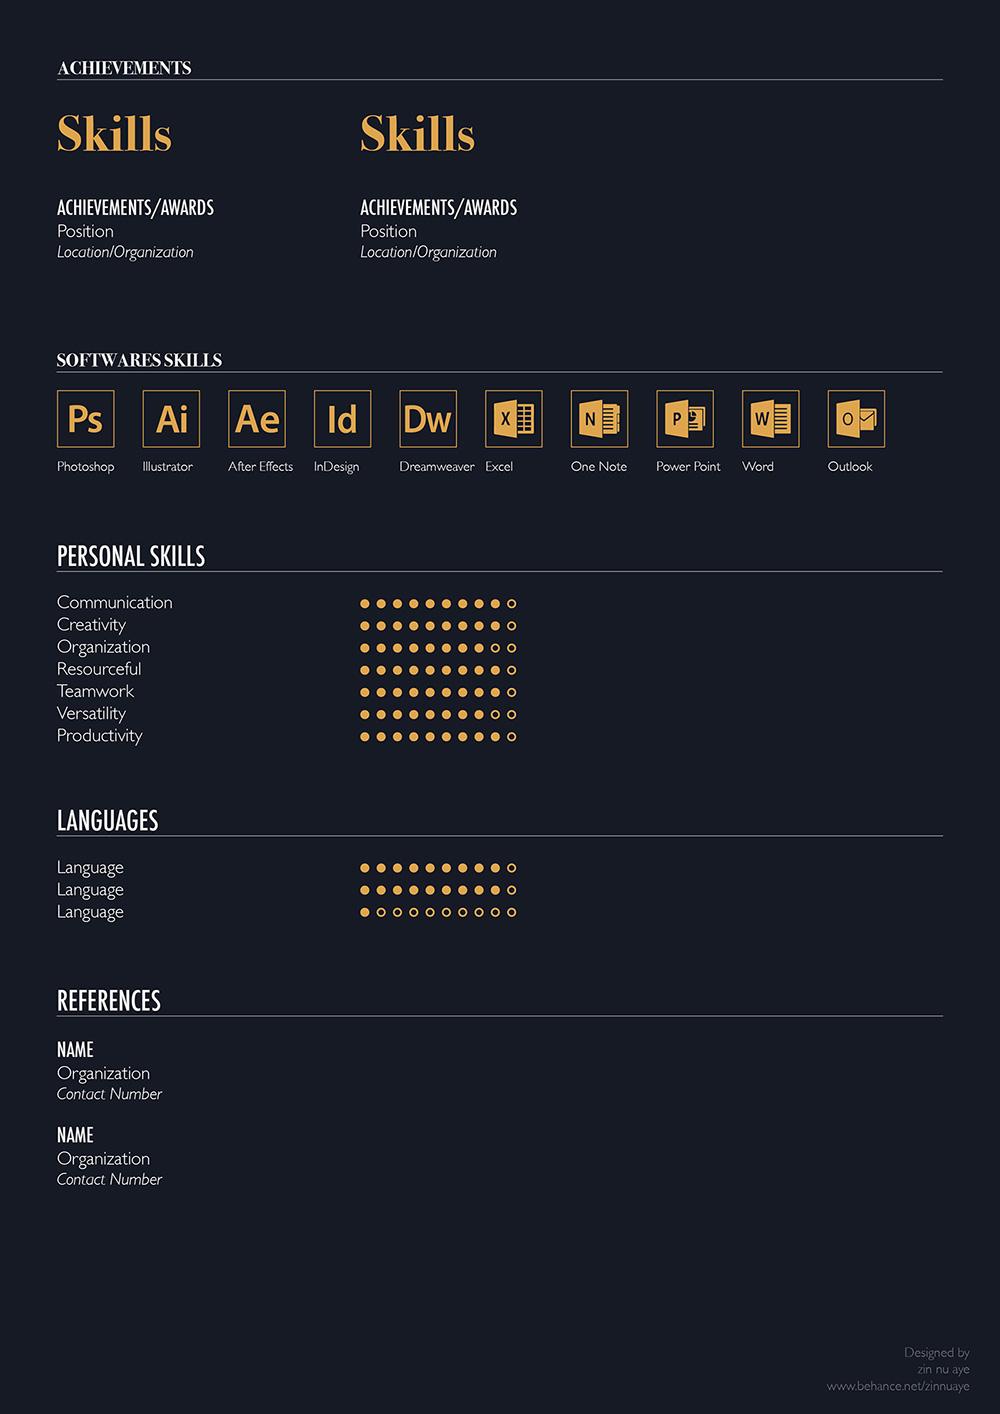 free-elegant-resume-template-for-designers-marketing-hr-i-t-professionals-4